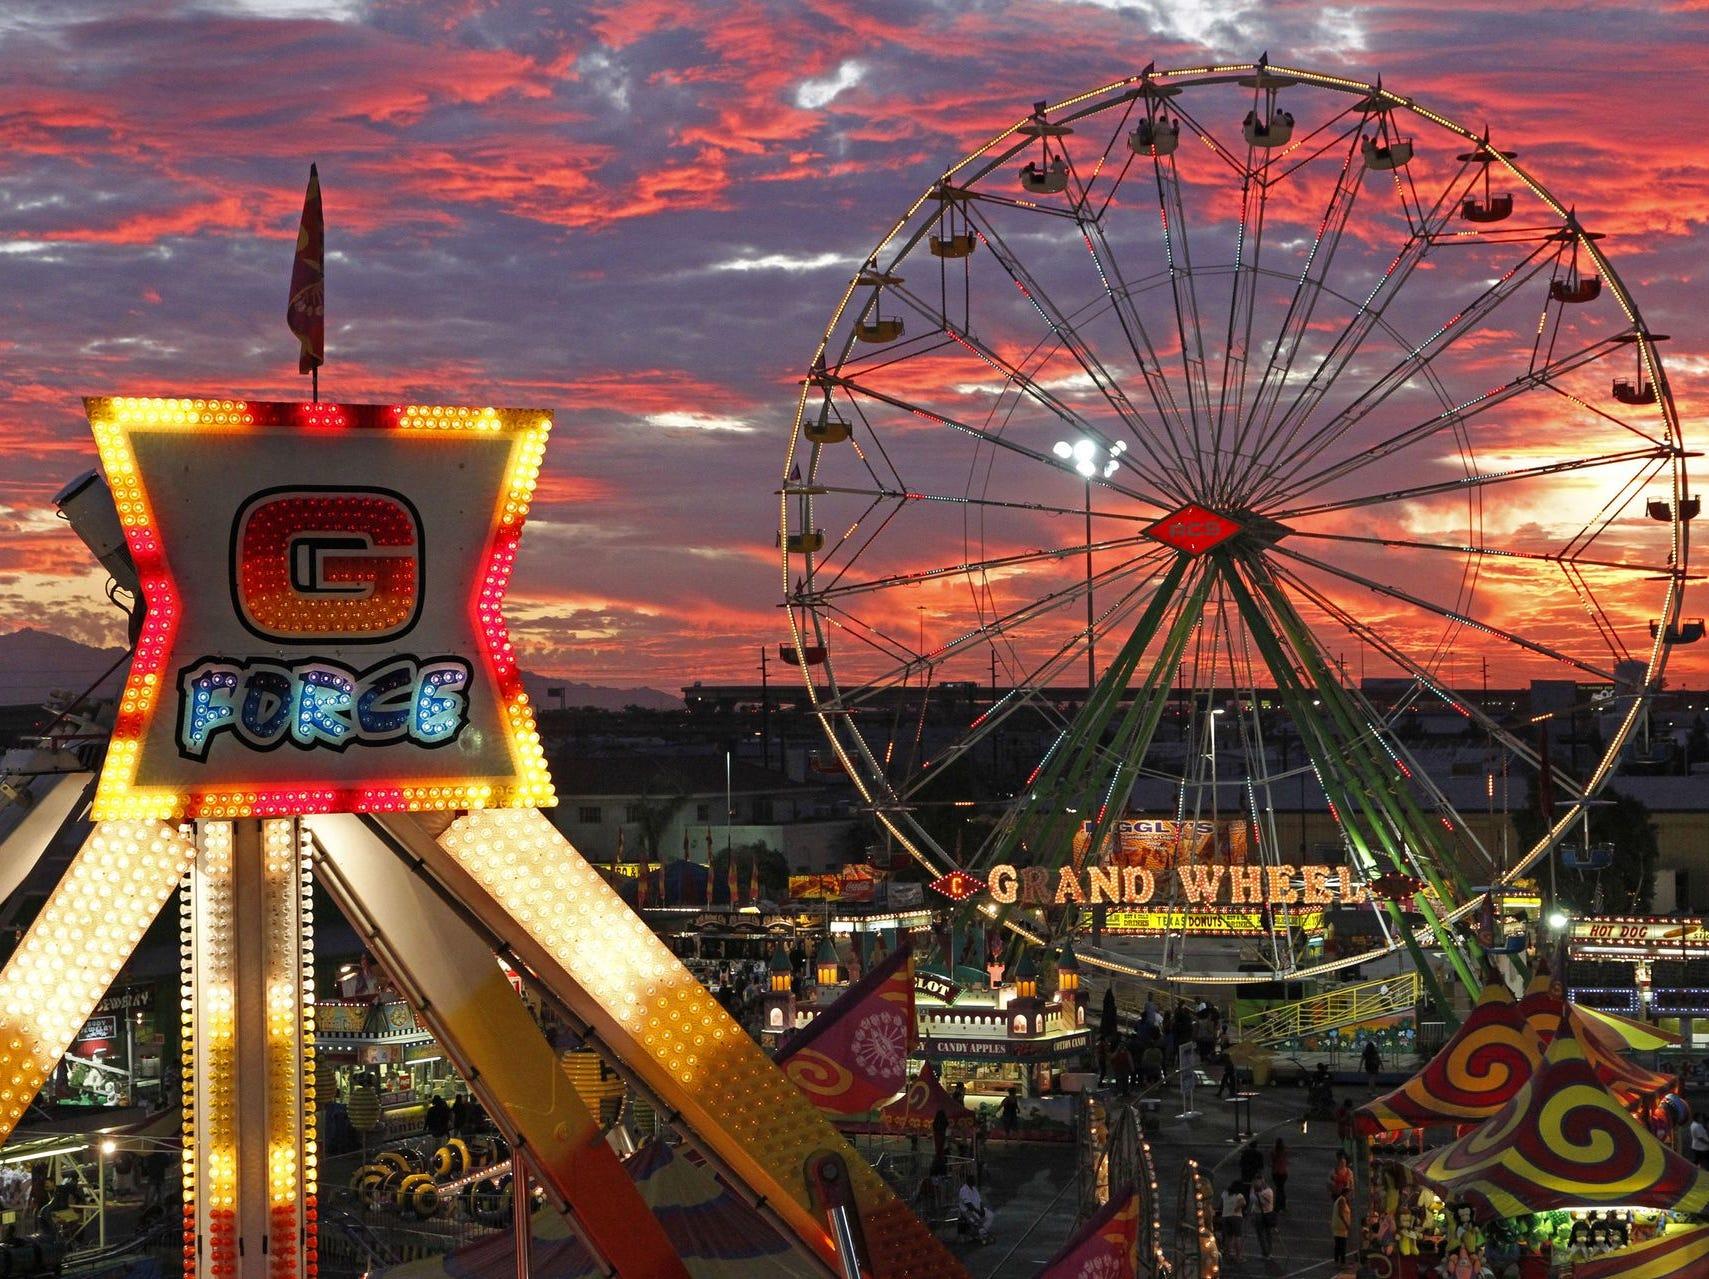 Puesta de sol en la Feria Estatal de Arizona en Phoenix, AZ.